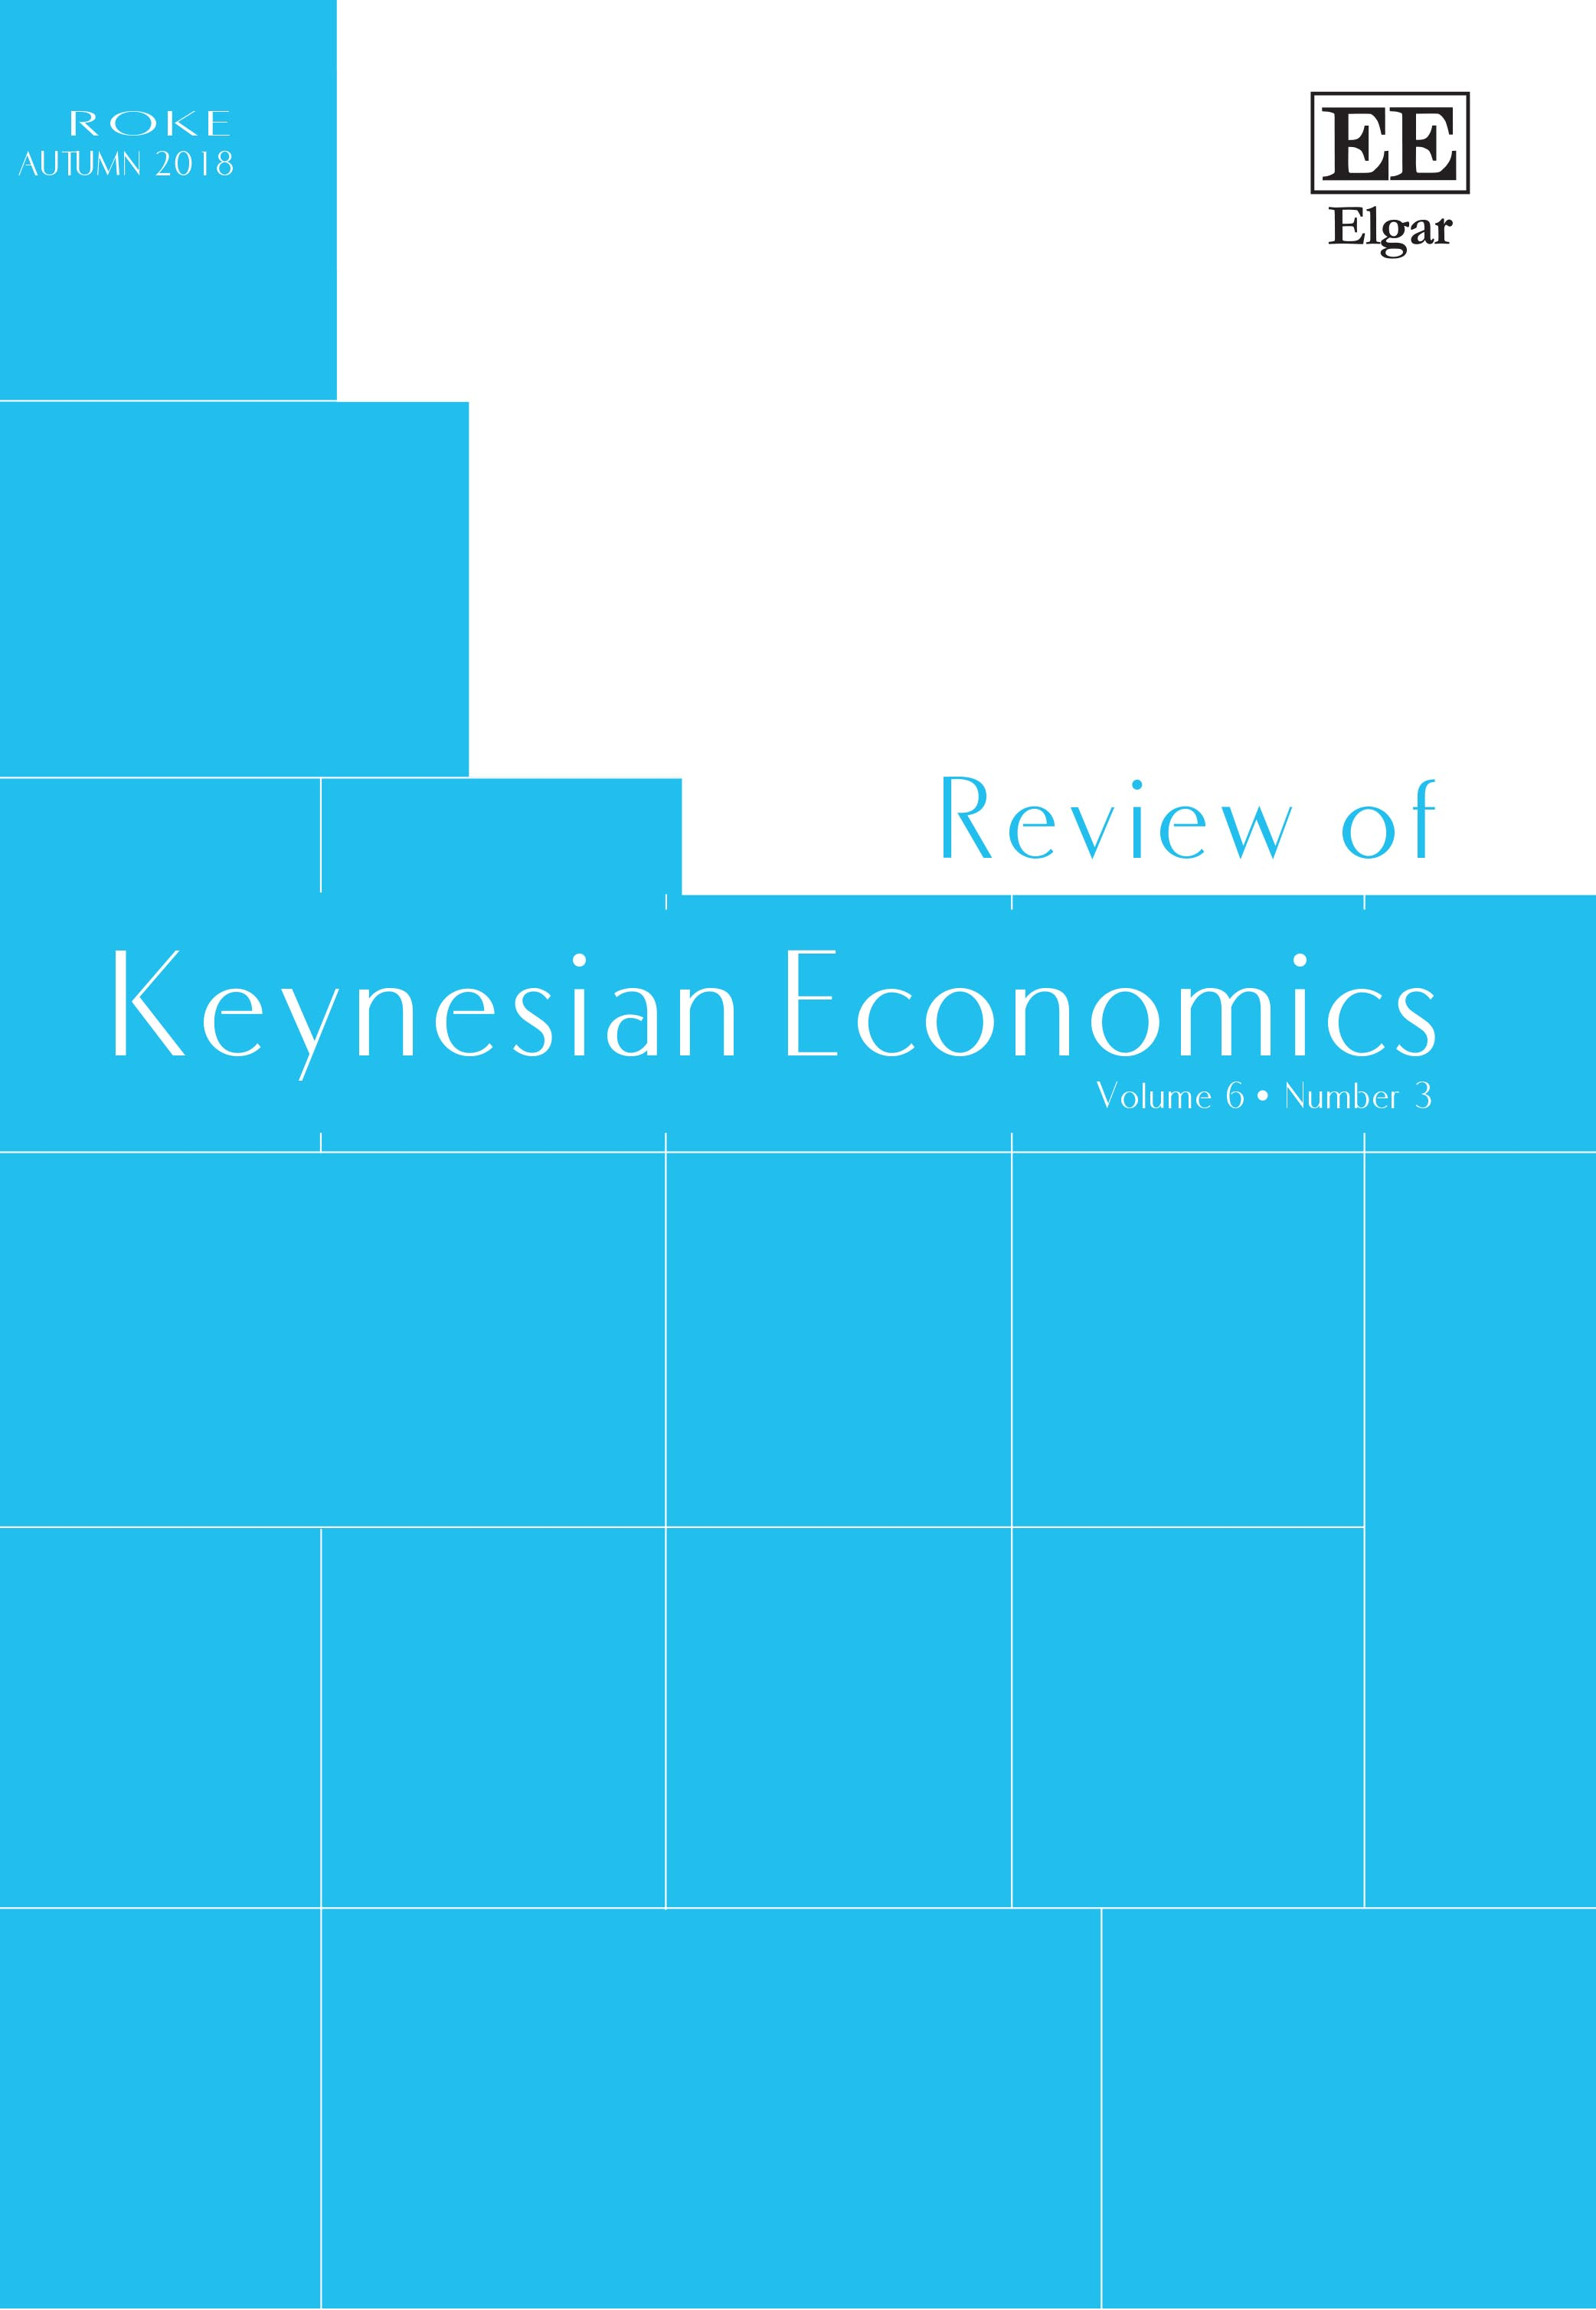 Review of Keynesian Economics : Review of Keynesian Economics